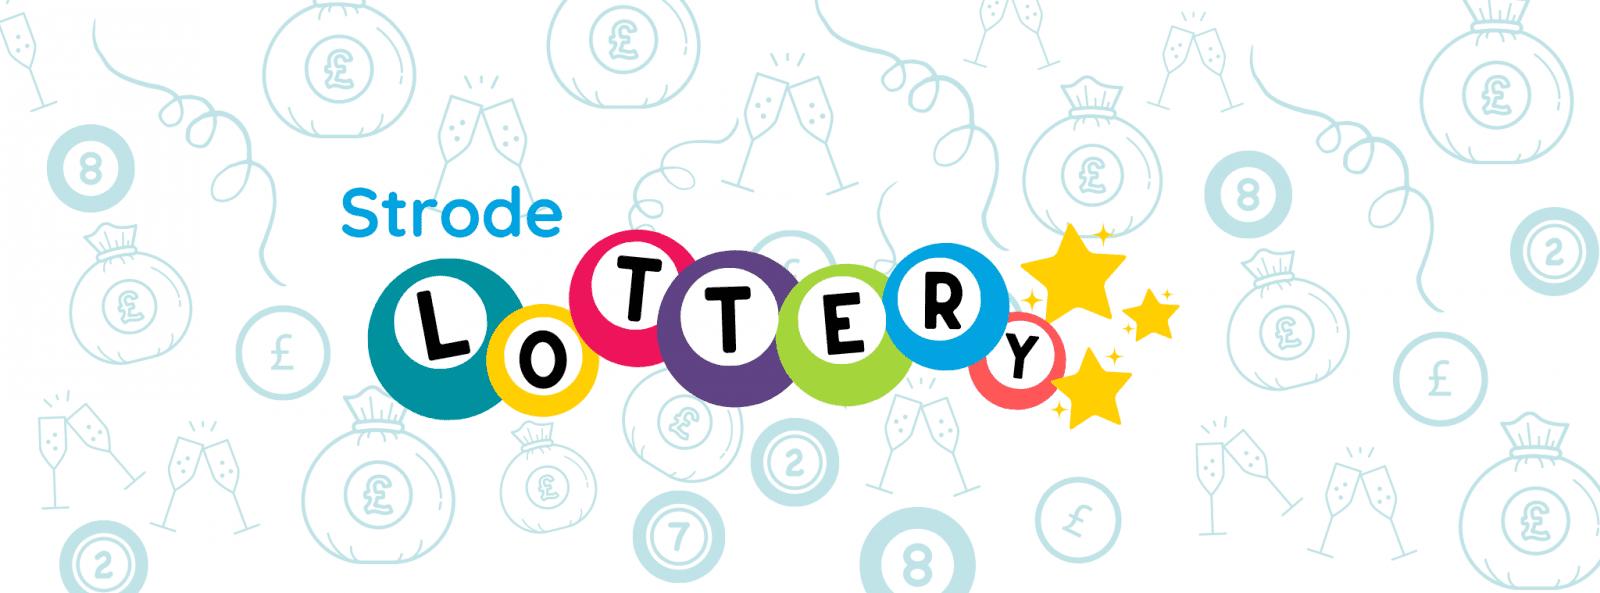 Strode Lottery banner